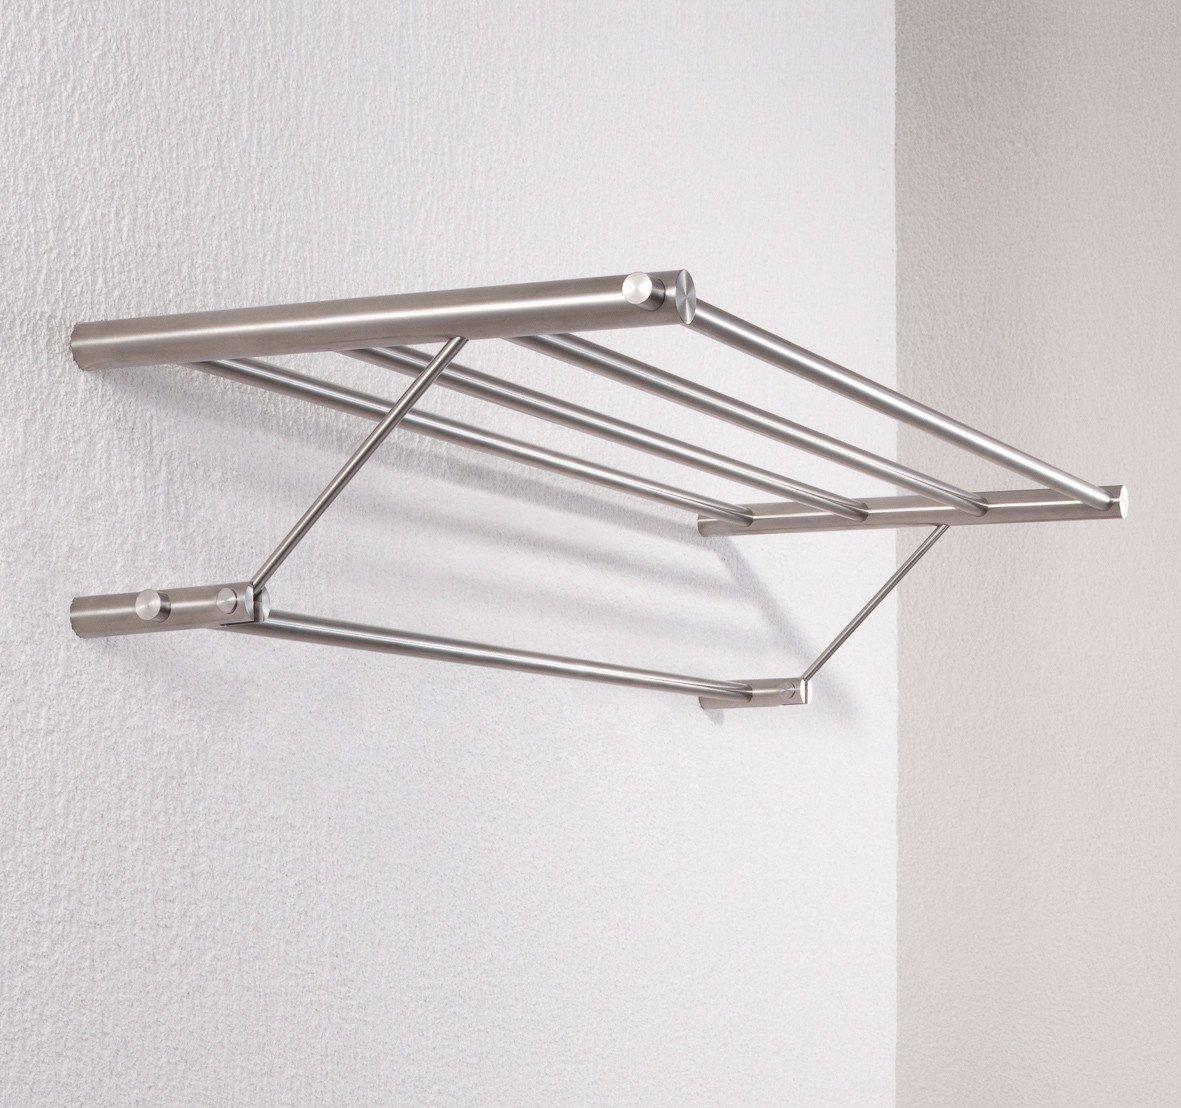 PSBA Shelf Towel Hanging Storage Towel Rack W/ Bar Holder Stainless Matte Steel( 25.2-inch)